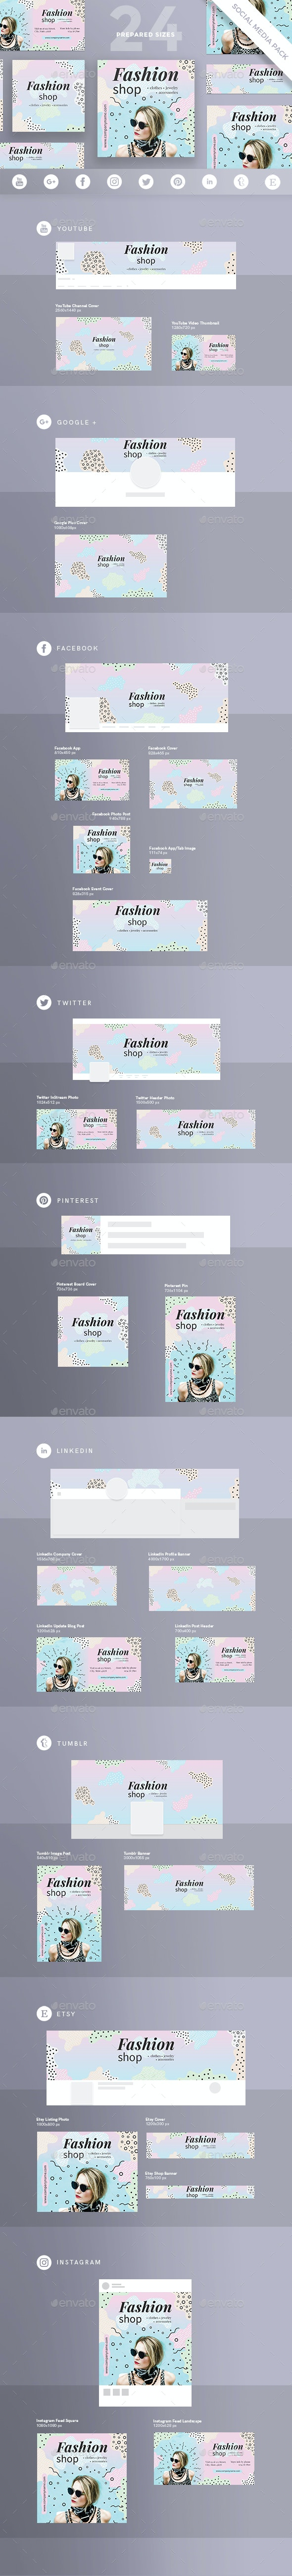 Fashion Shop Social Media Pack - Miscellaneous Social Media